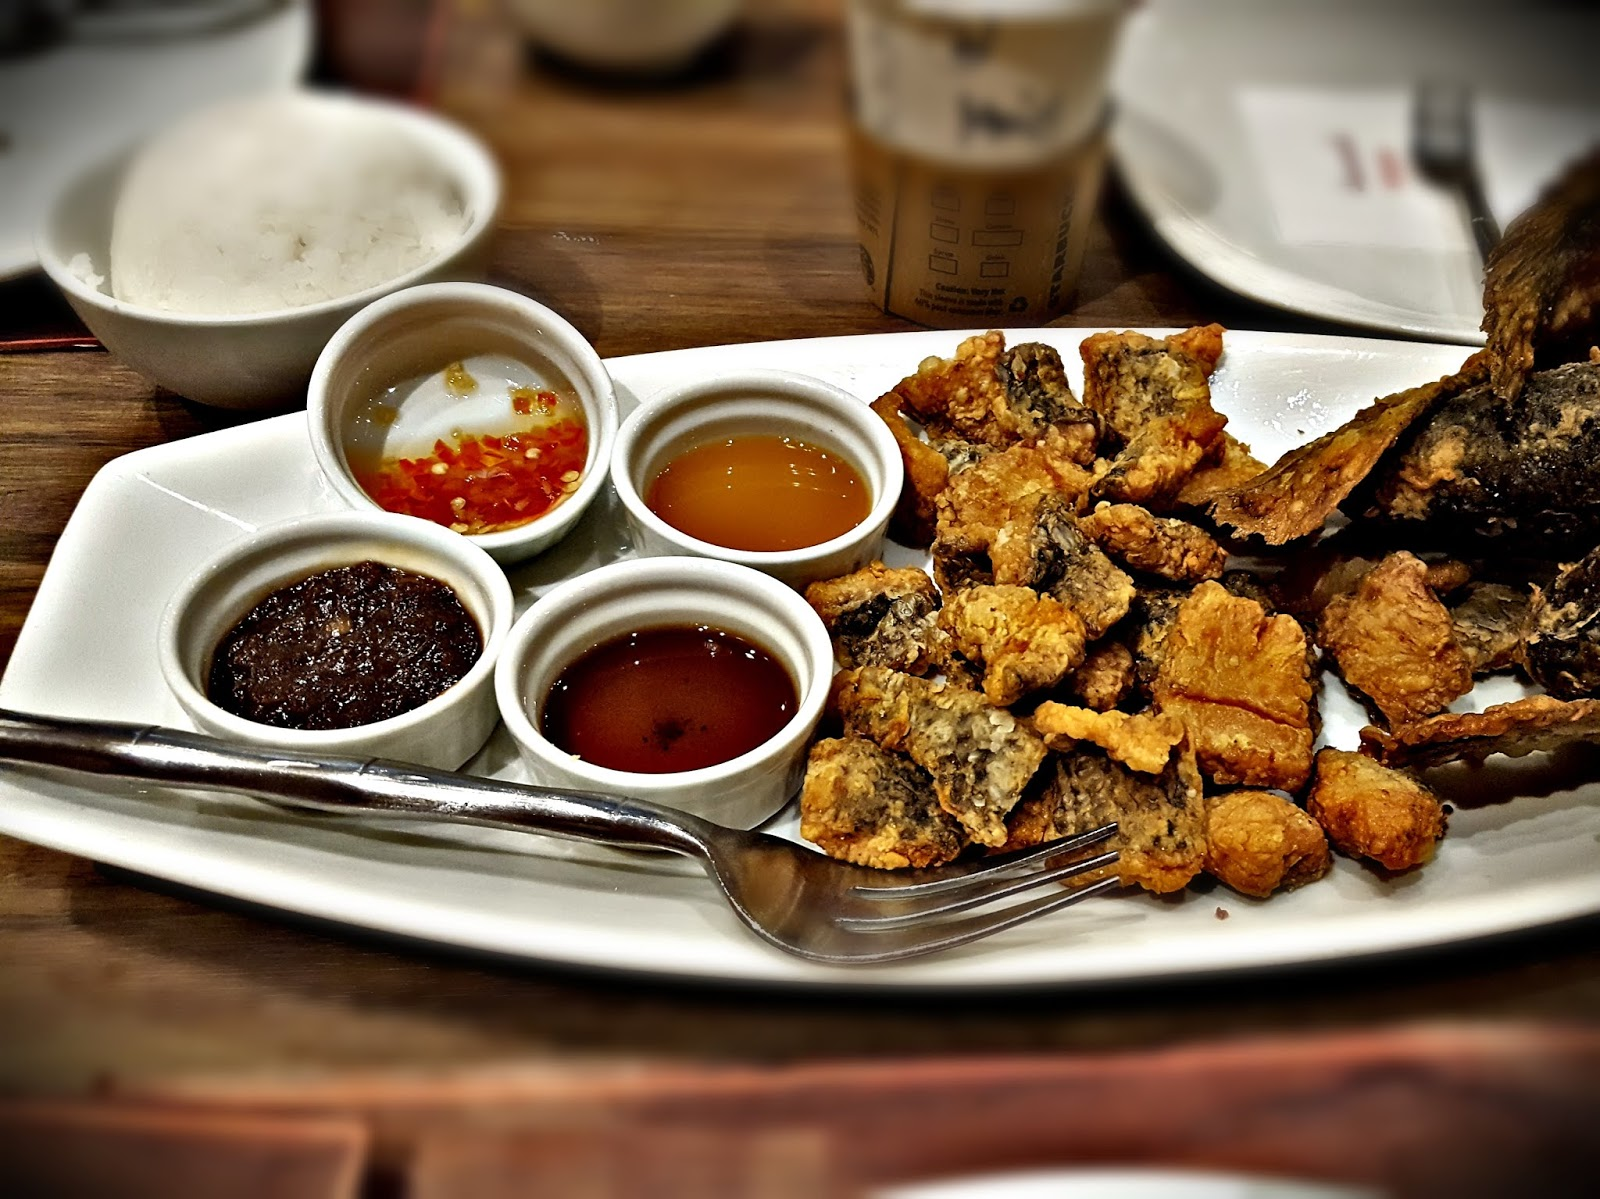 crispy tilapia mesa filipino moderne cuisine www.jeepneyrecipes.com